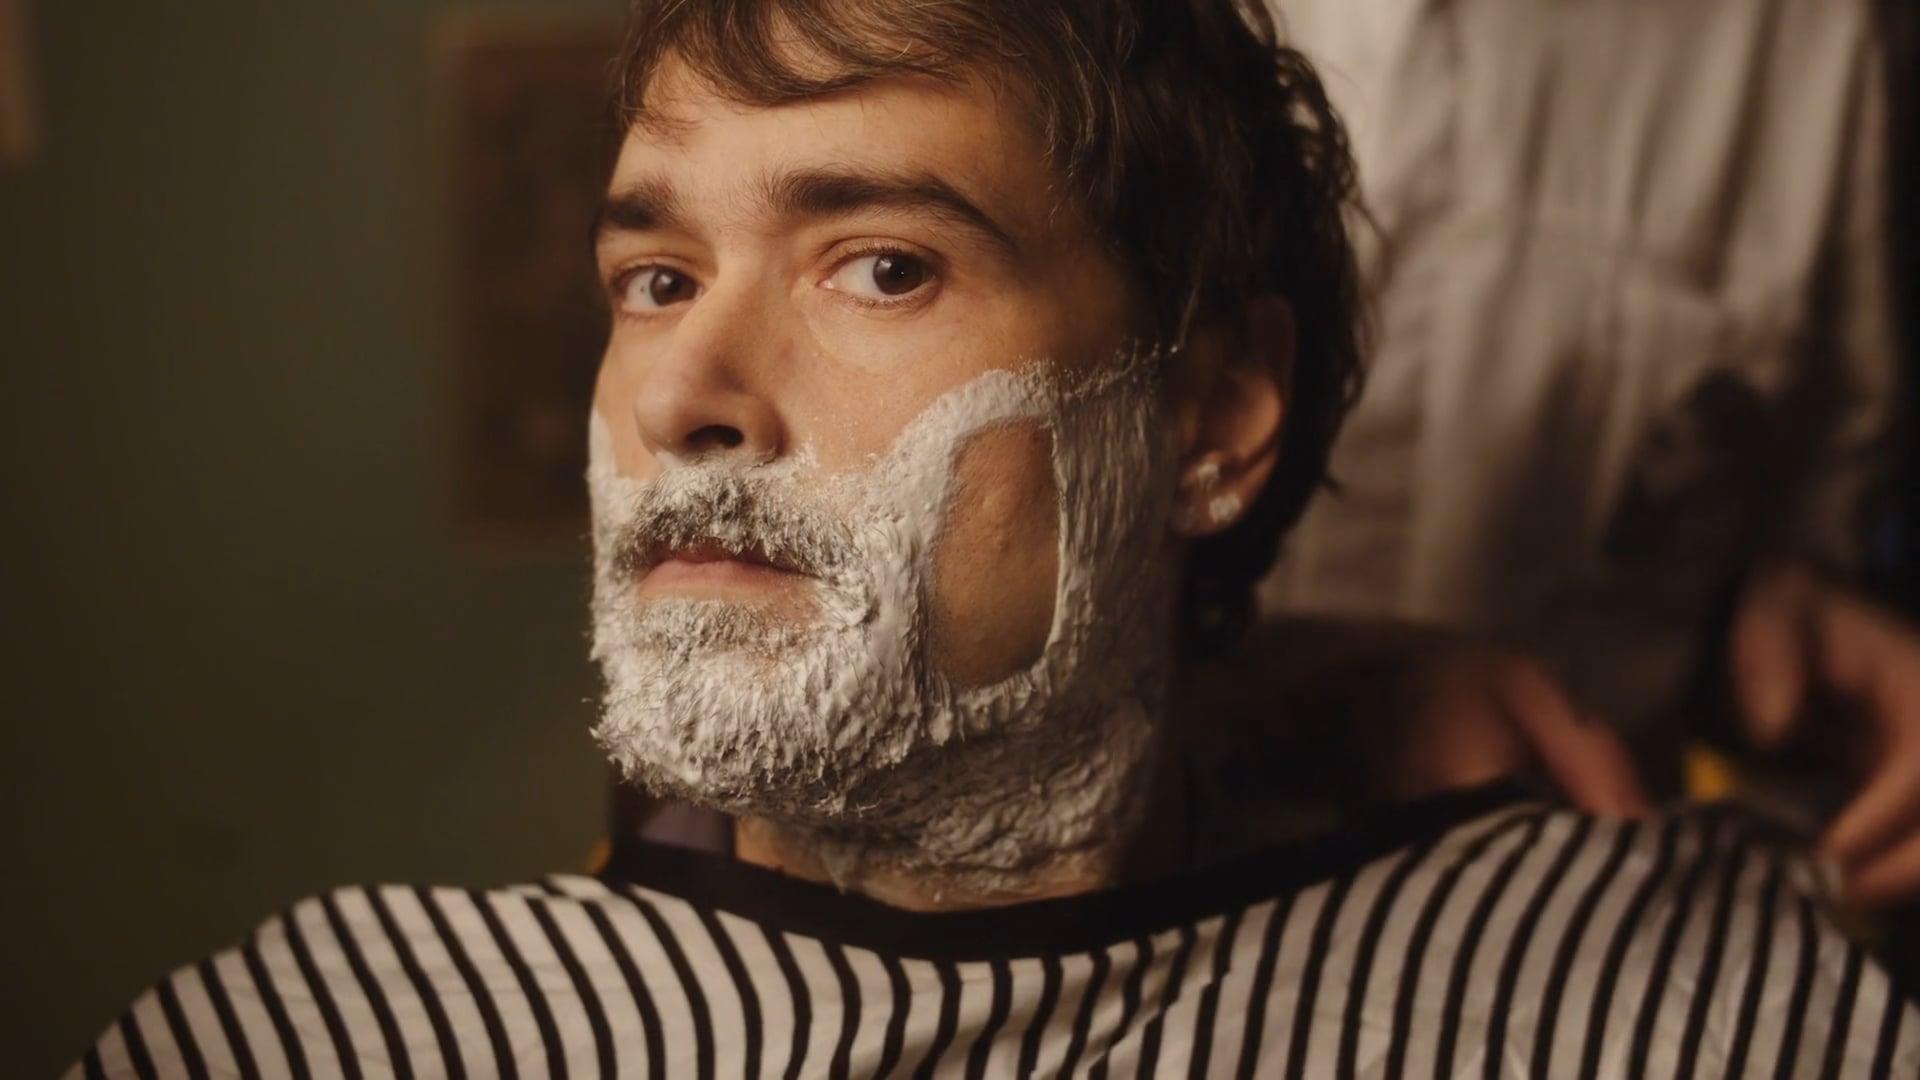 Fabian Epe ▲ WOZ - Barbier